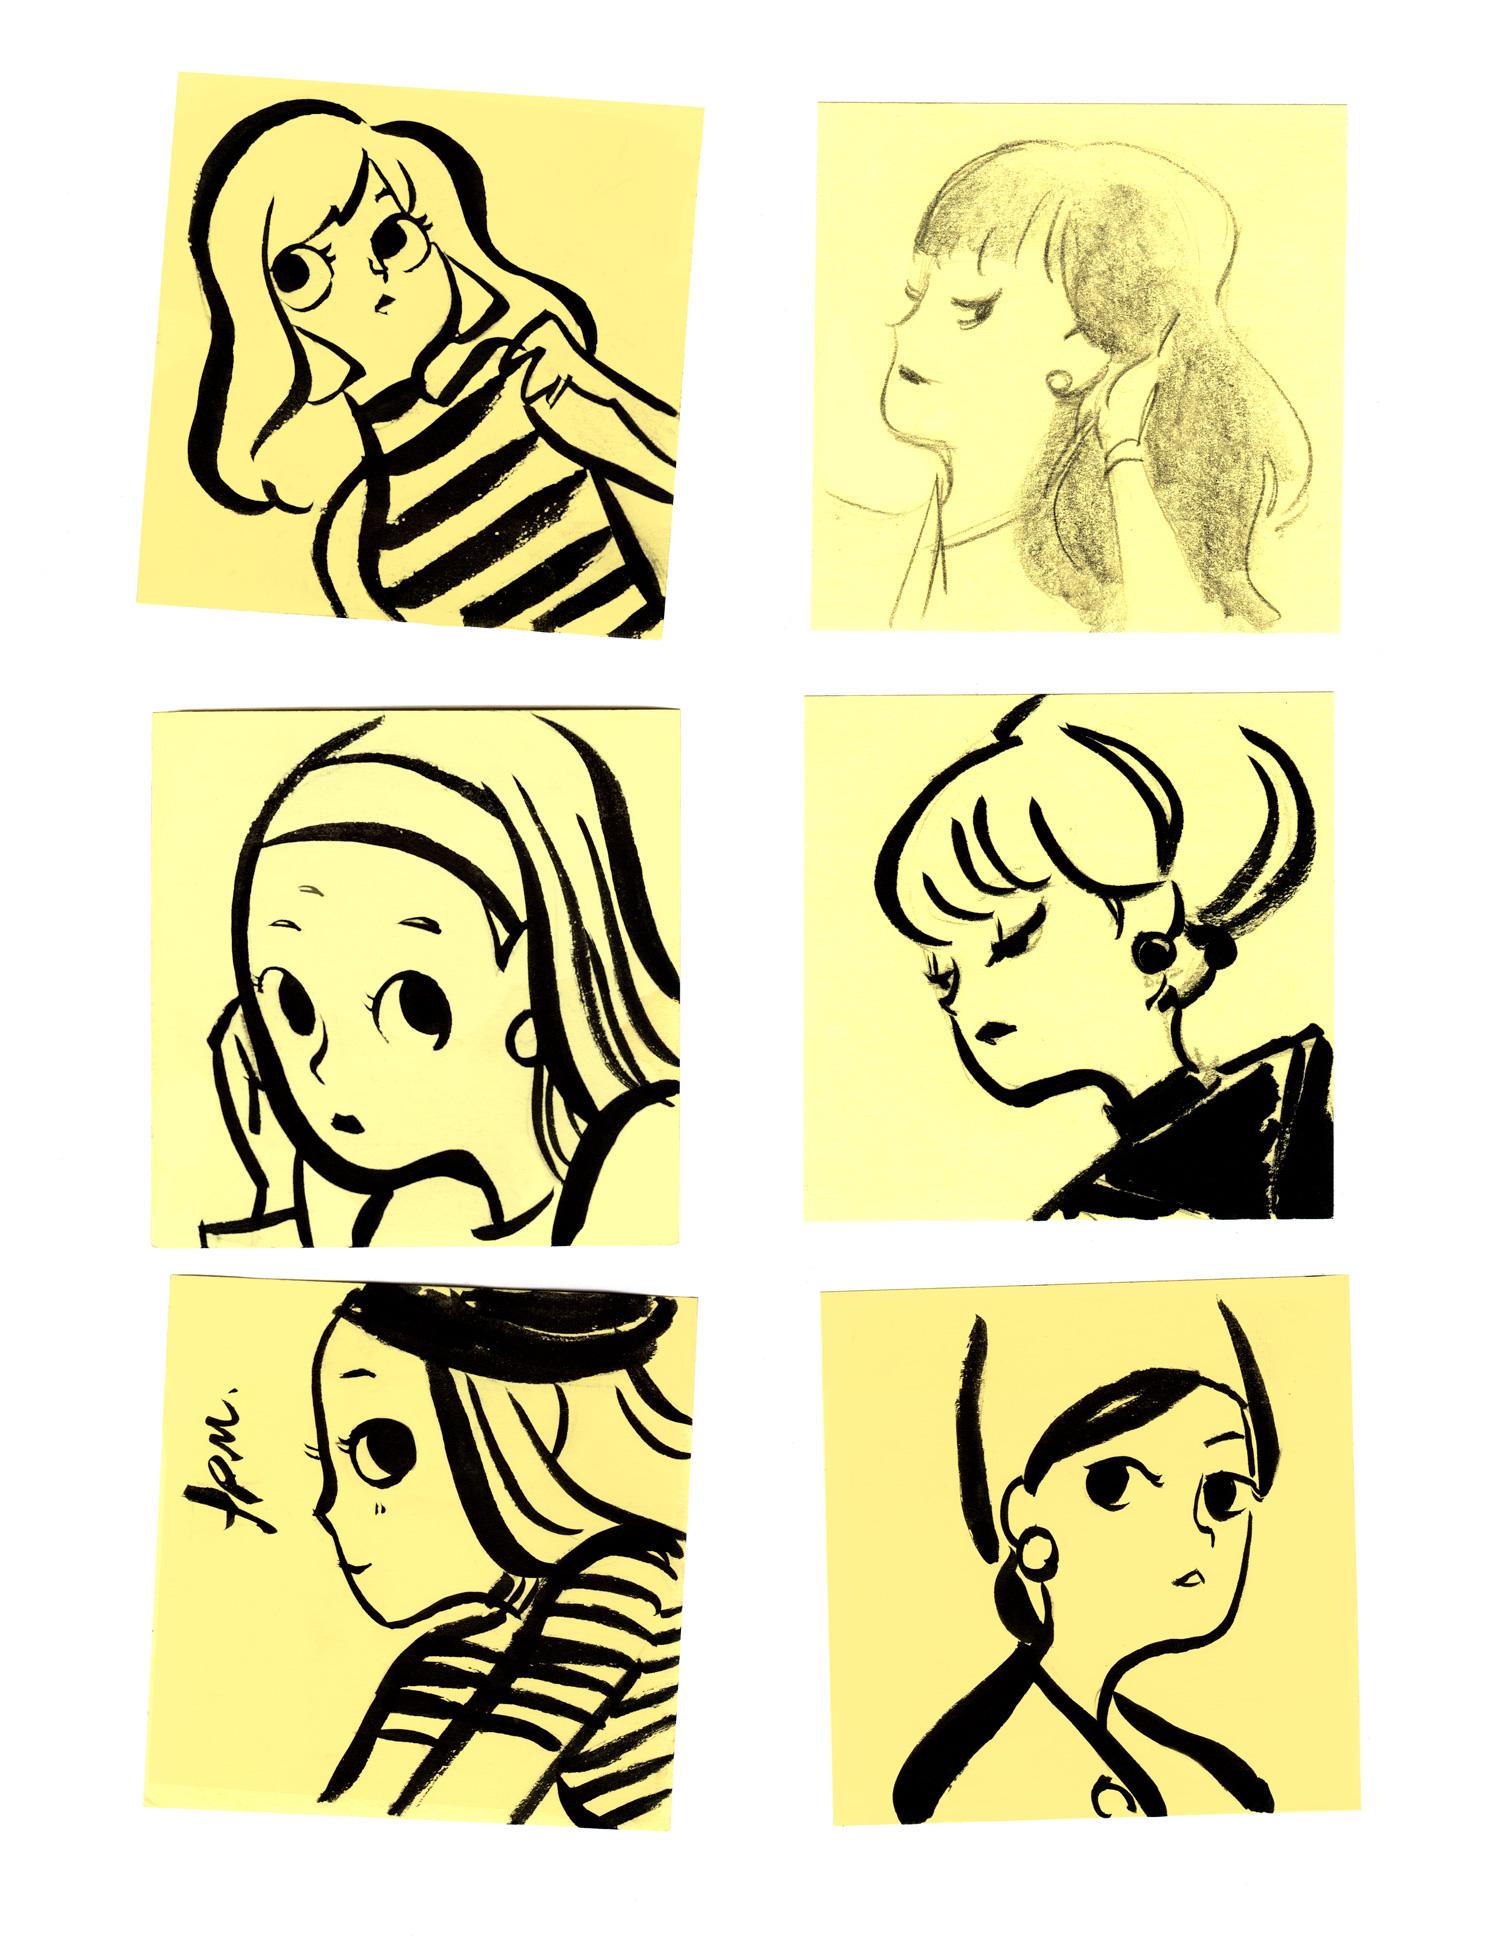 006-post-it-girls-02-1500.jpg